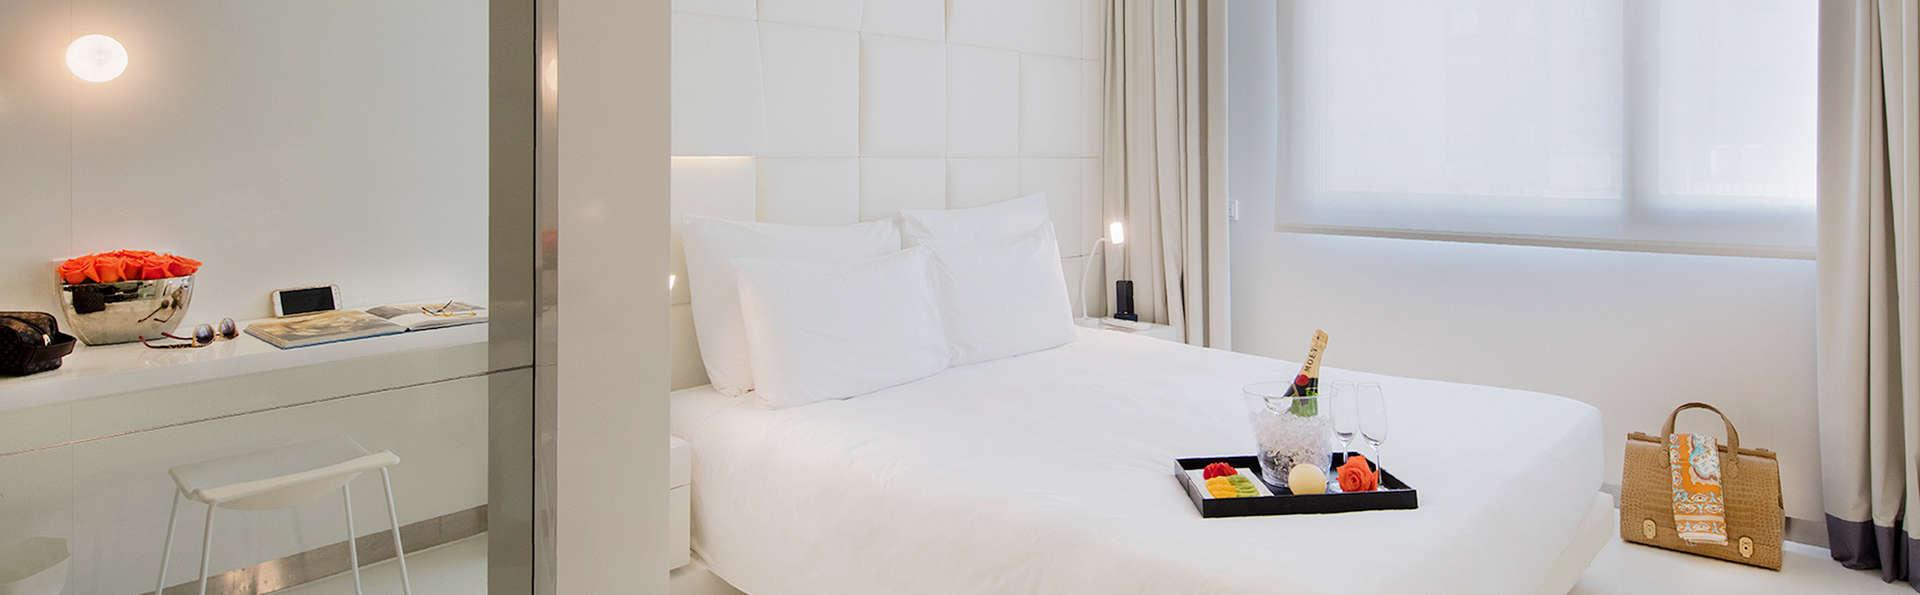 Descubre Barcelona en un hotel 4* de lujo a 200 m. de Paseo de Gracia